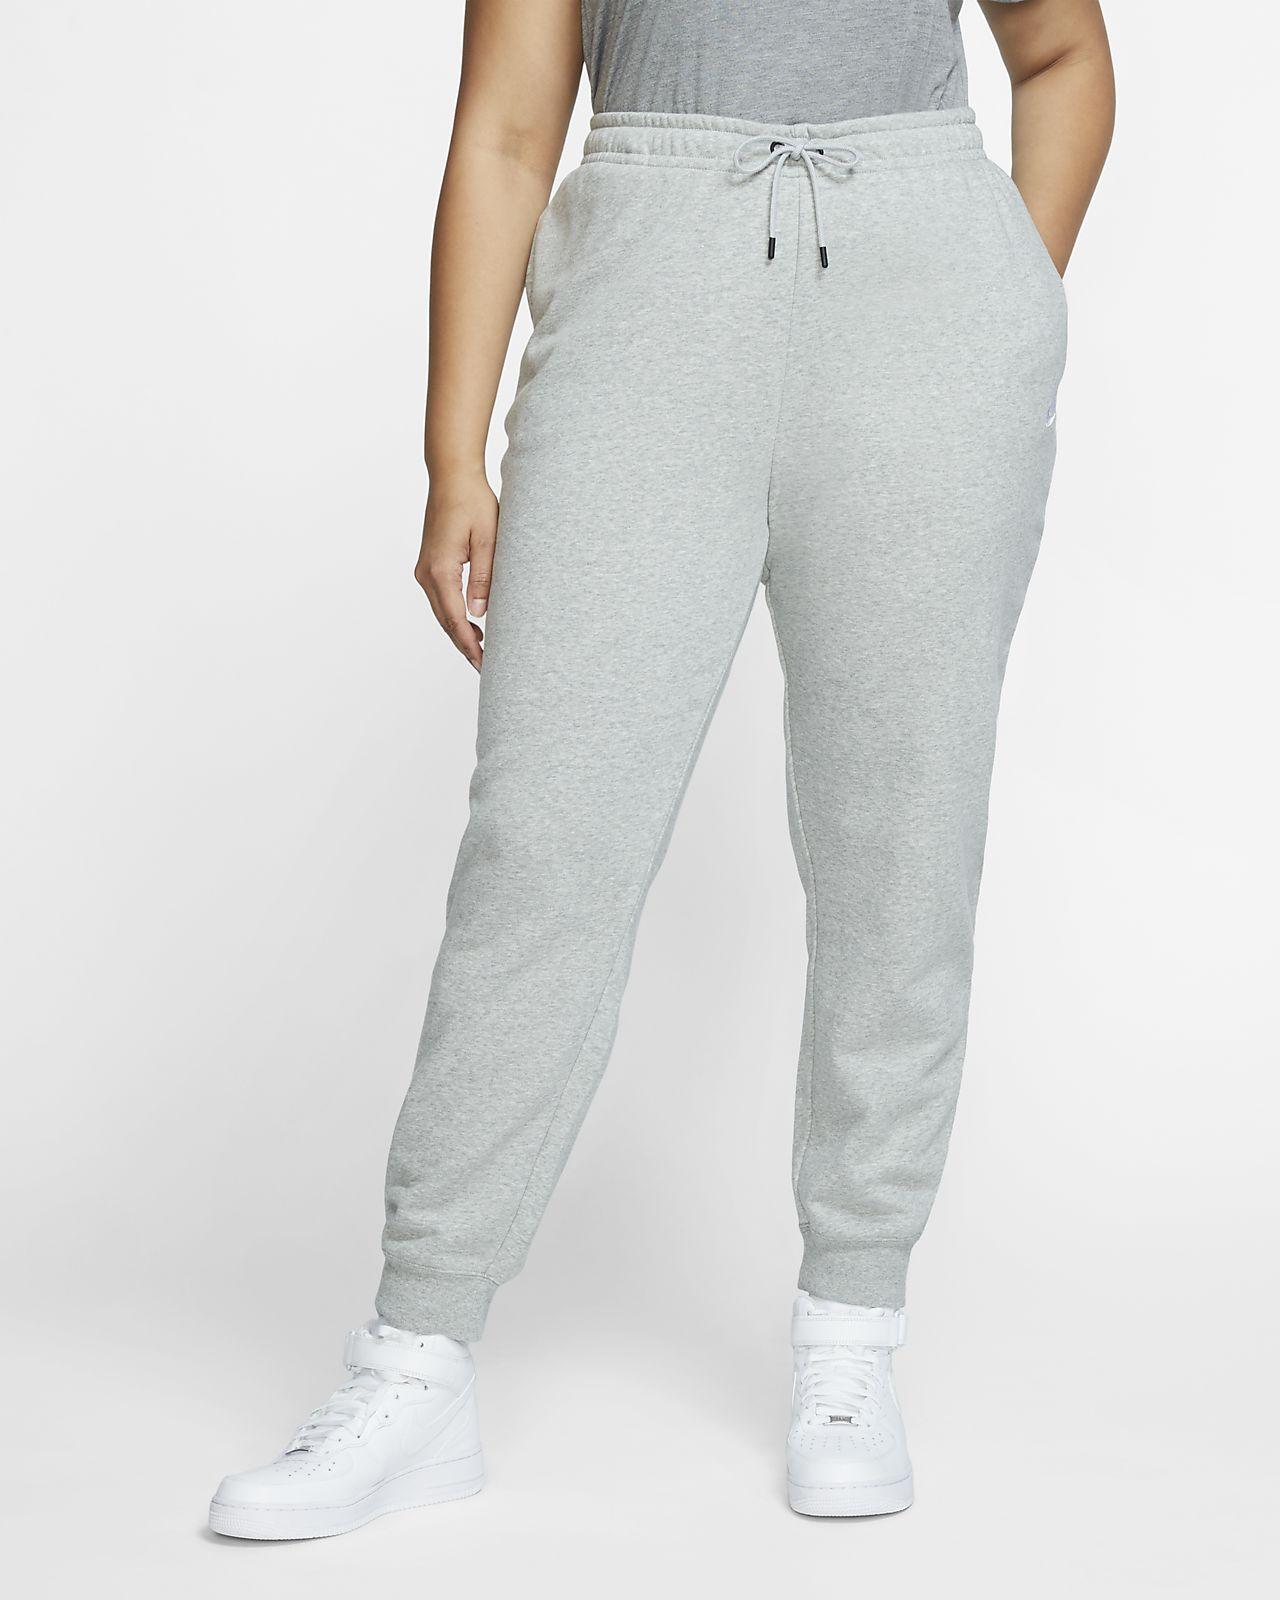 NIKE SPORTSWEAR Essential Pantalone tuta per Donna Nero